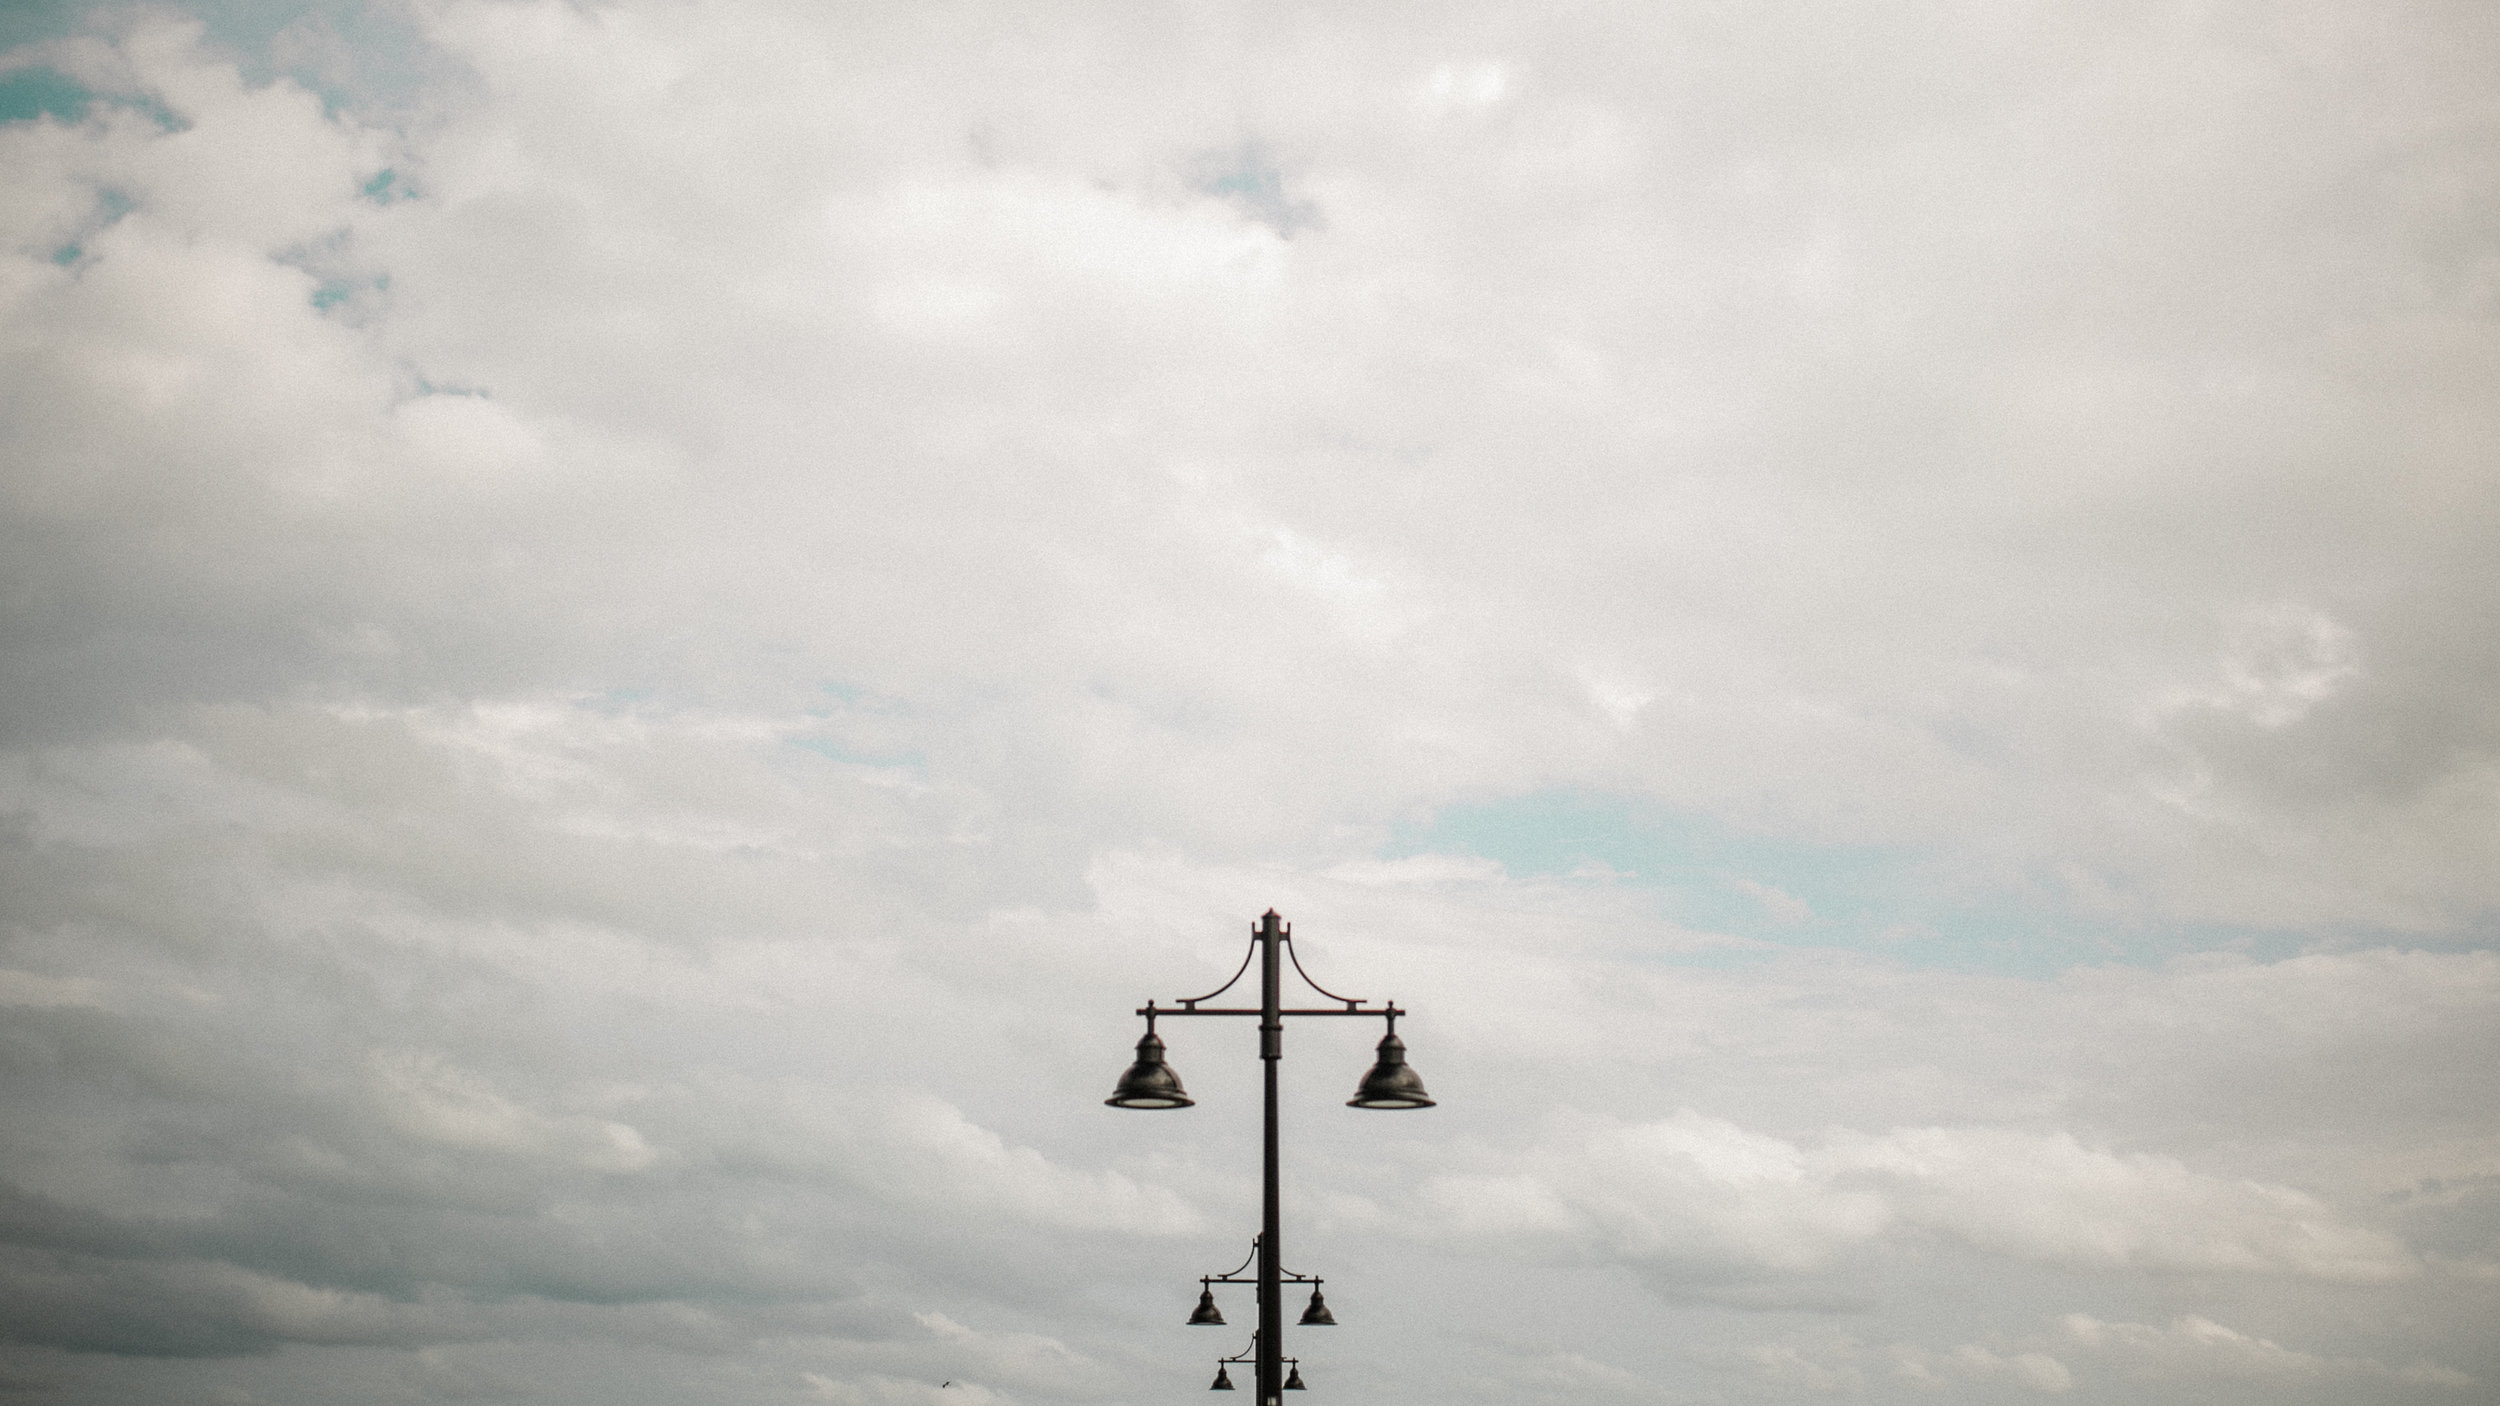 pier, florida, florida photographer, florida keys, tropical, destination wedding, elopement, beach life, island, southern life, key west wedding, engagement, fort zachary, lena perkins, key west, key west photography, key west rooster-17.jpg